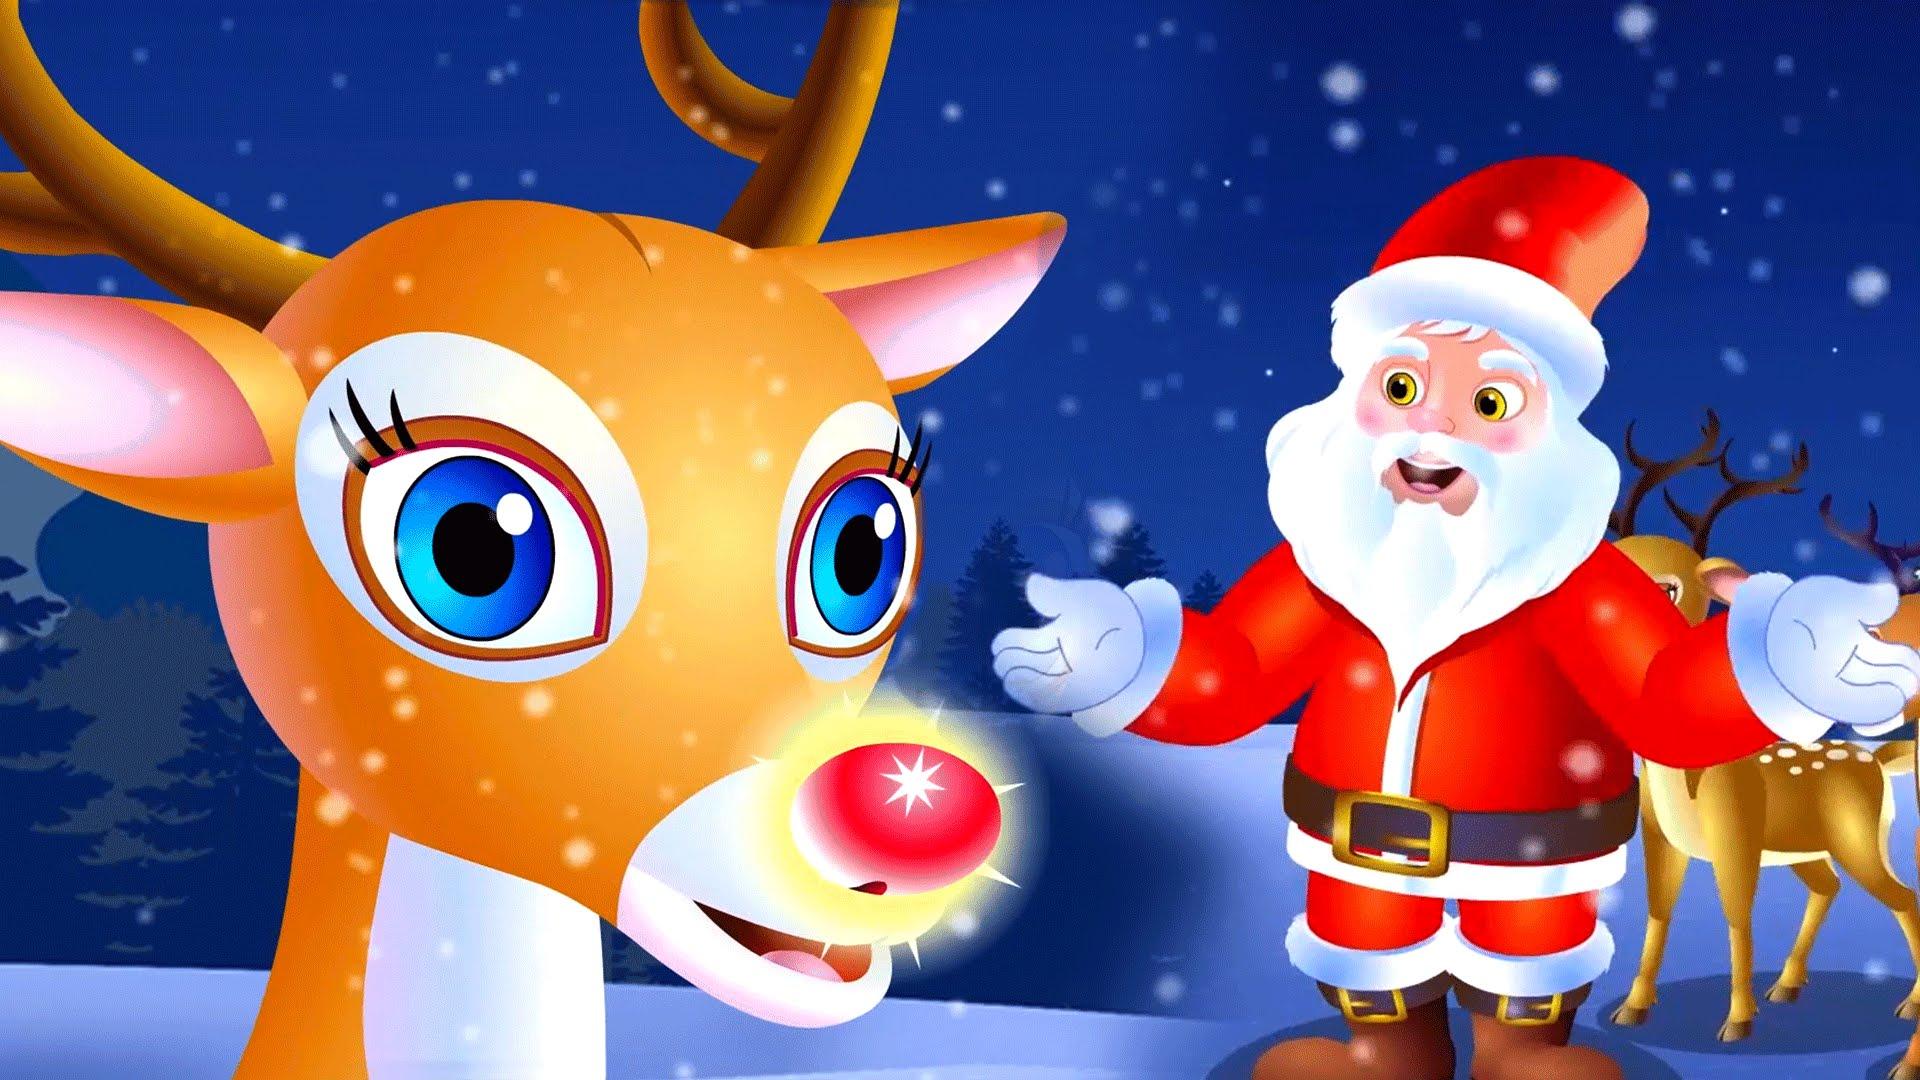 Santa Claus With Reindeer Wallpaper